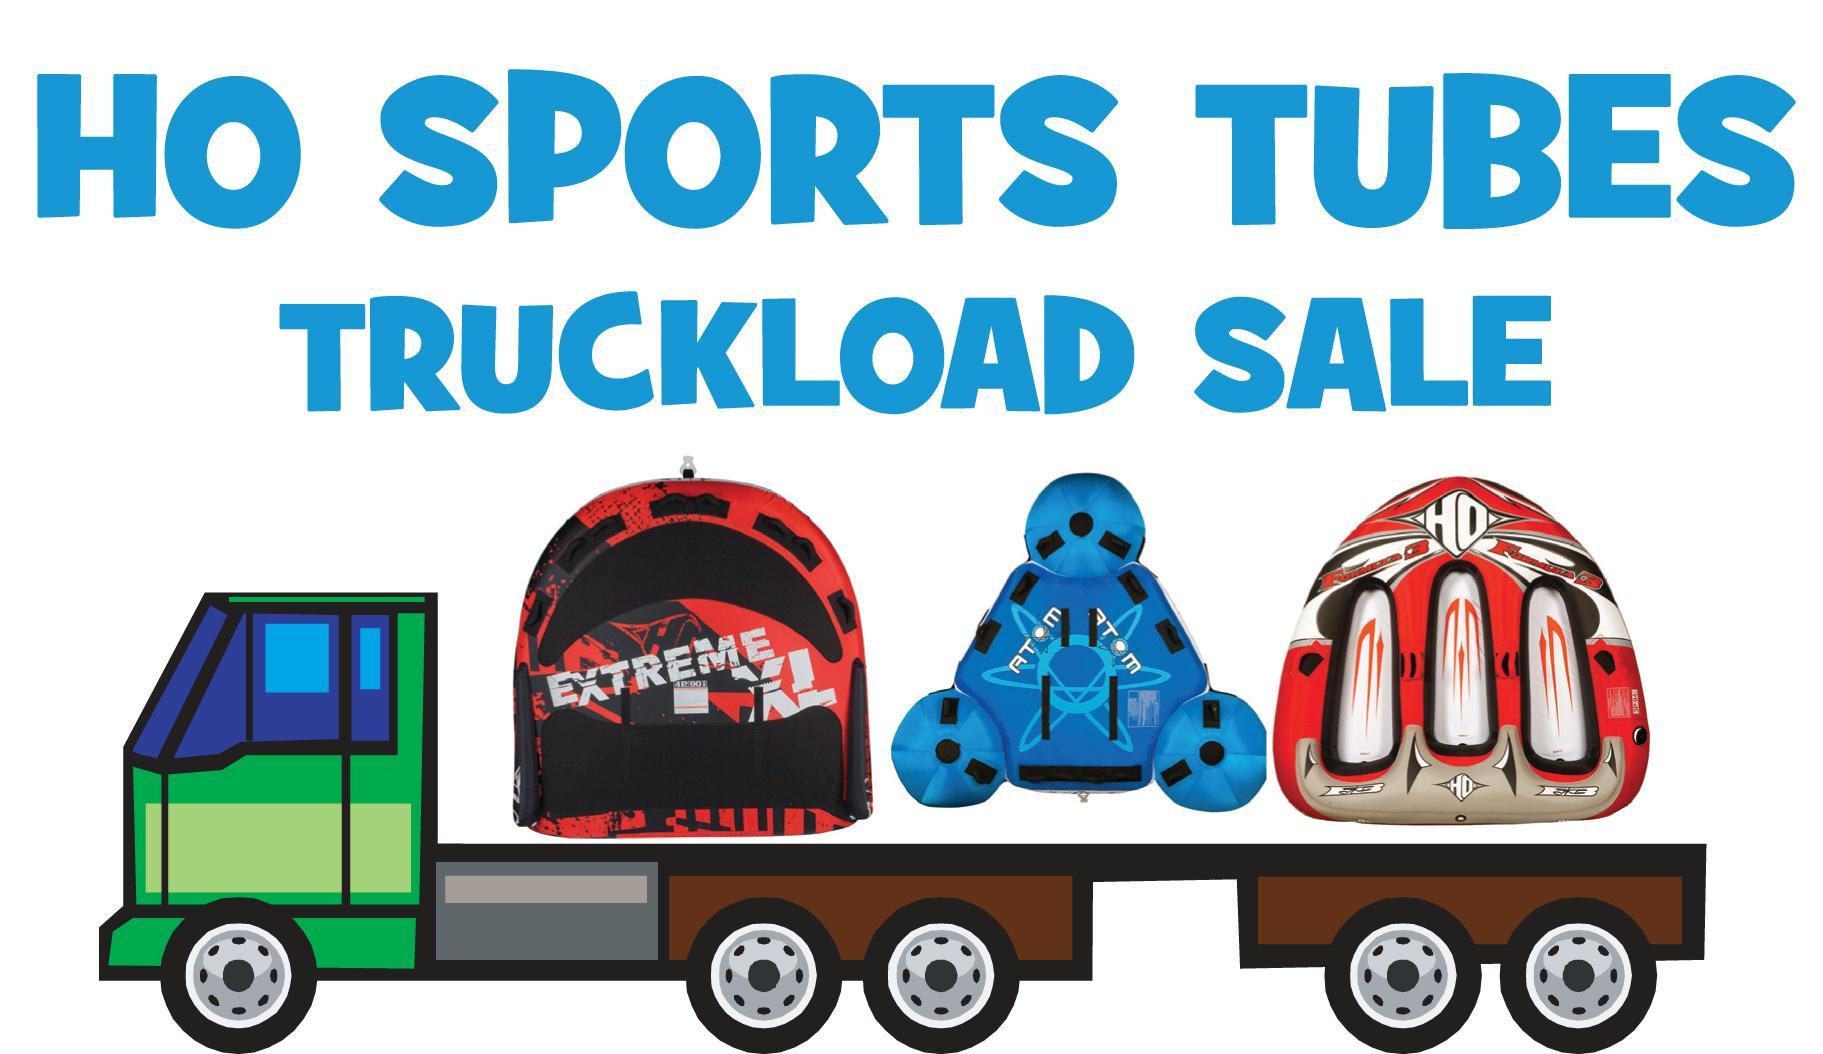 HO Sports Tube Truckload Sale